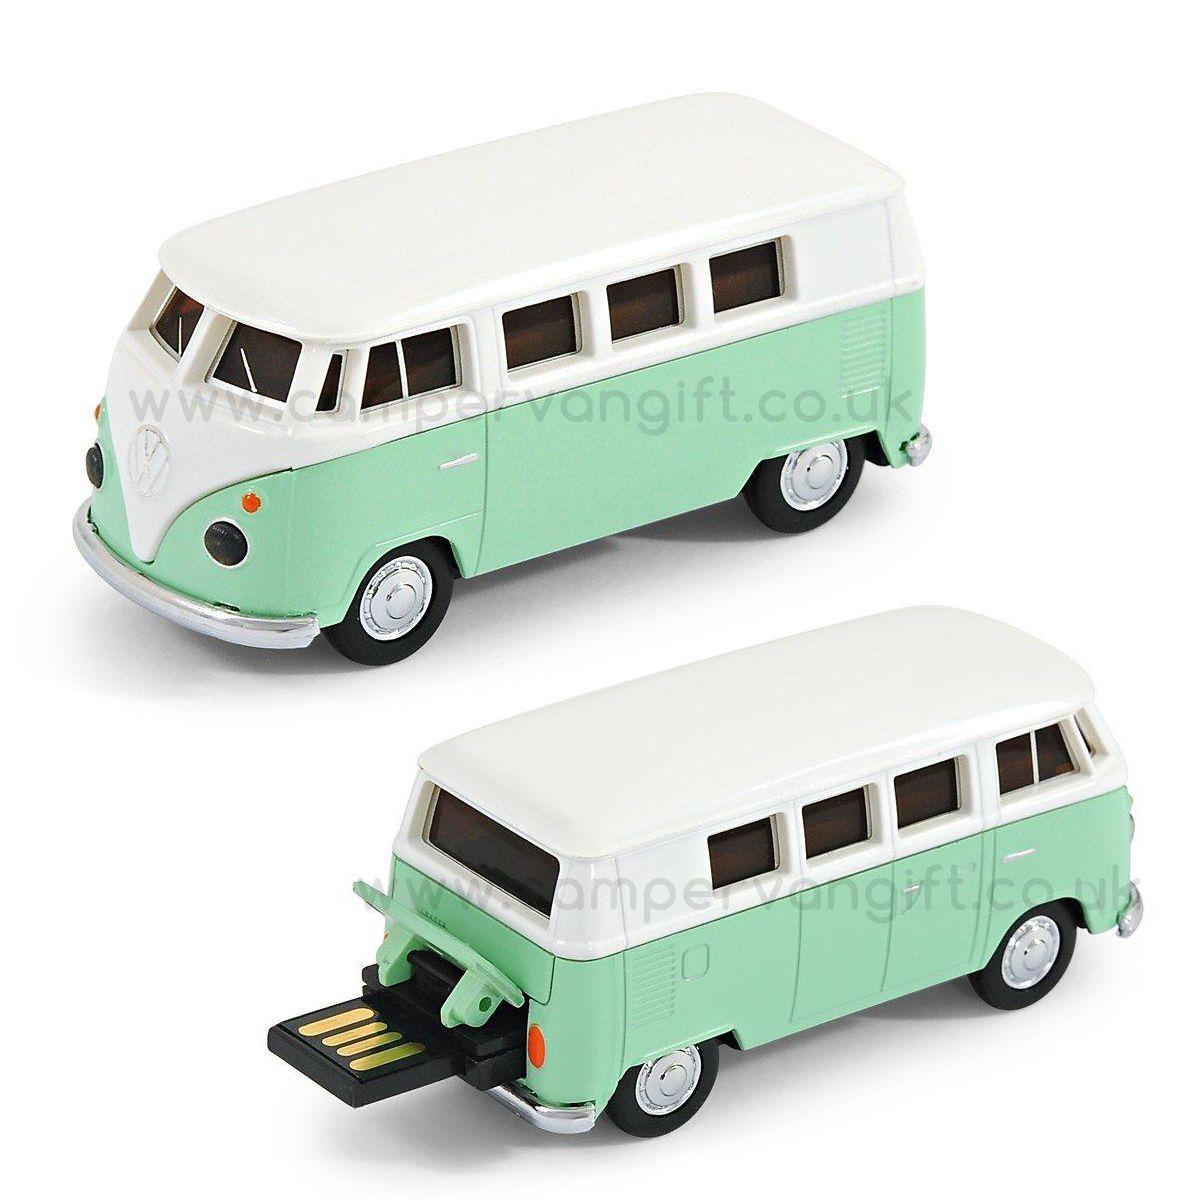 Vw Green Campervan 8gb Usb Memory Stick Campervan Gifts Usb